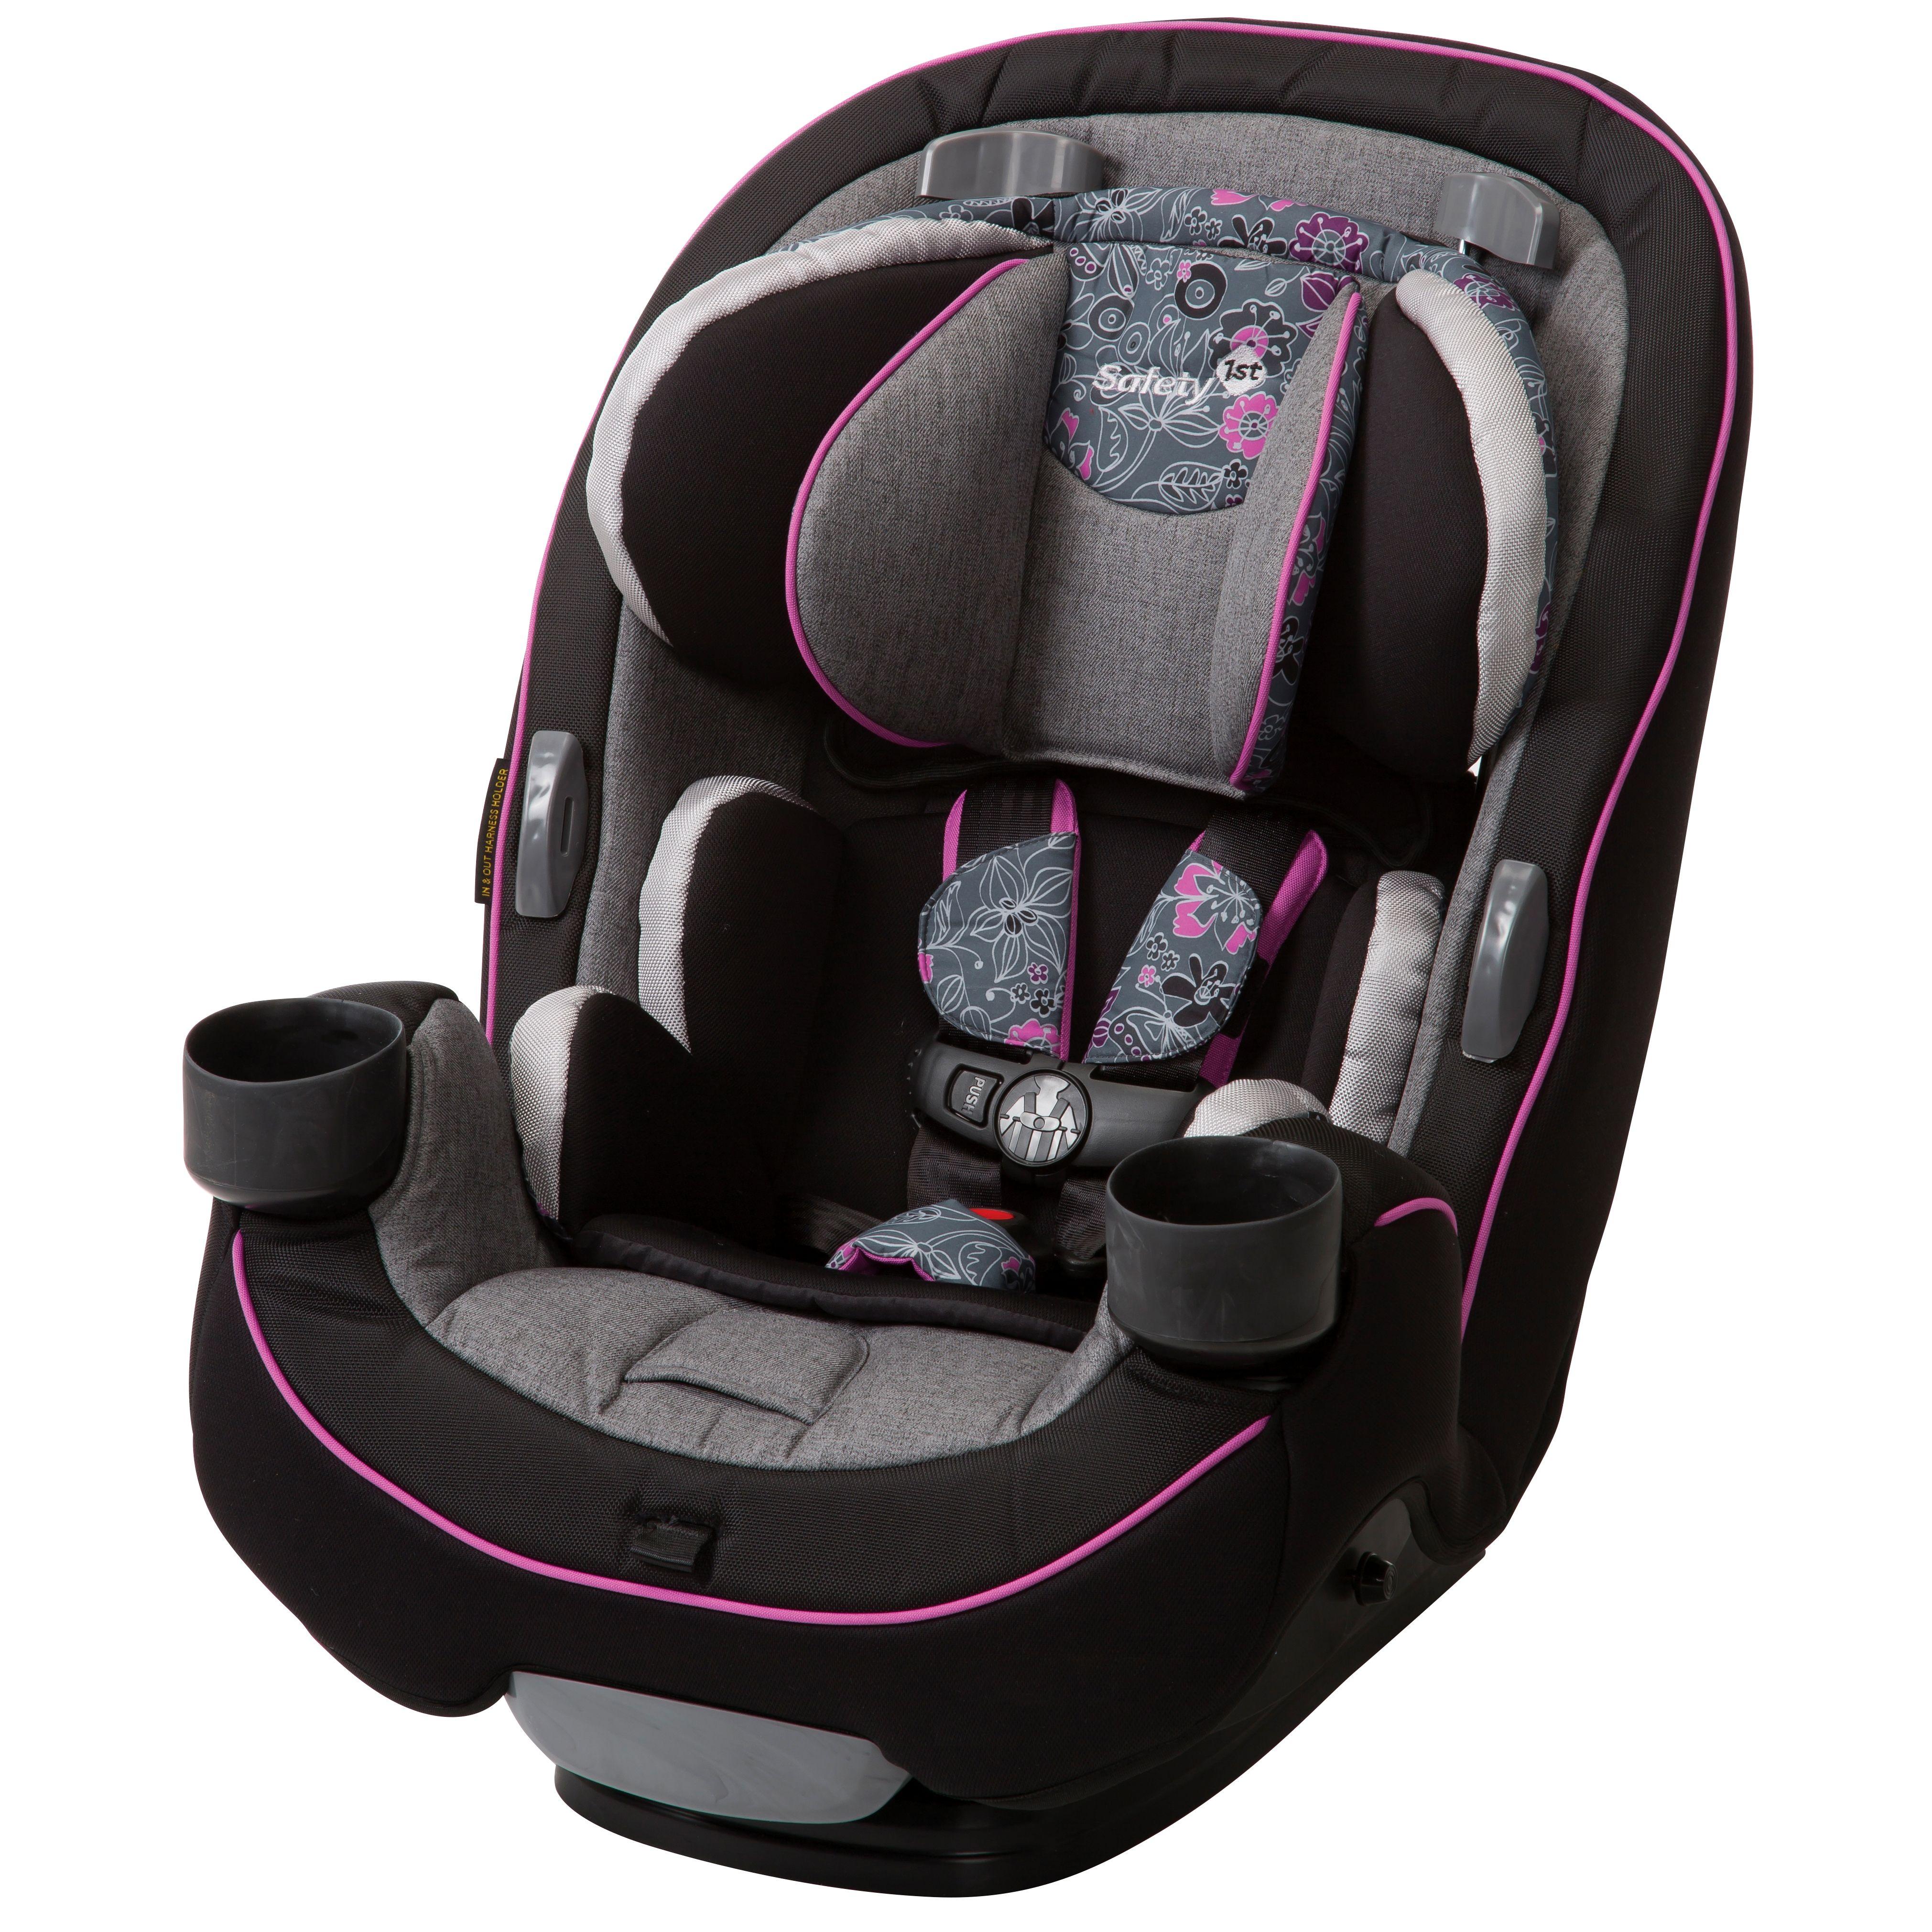 car seats for children, convertible car seats,car seat